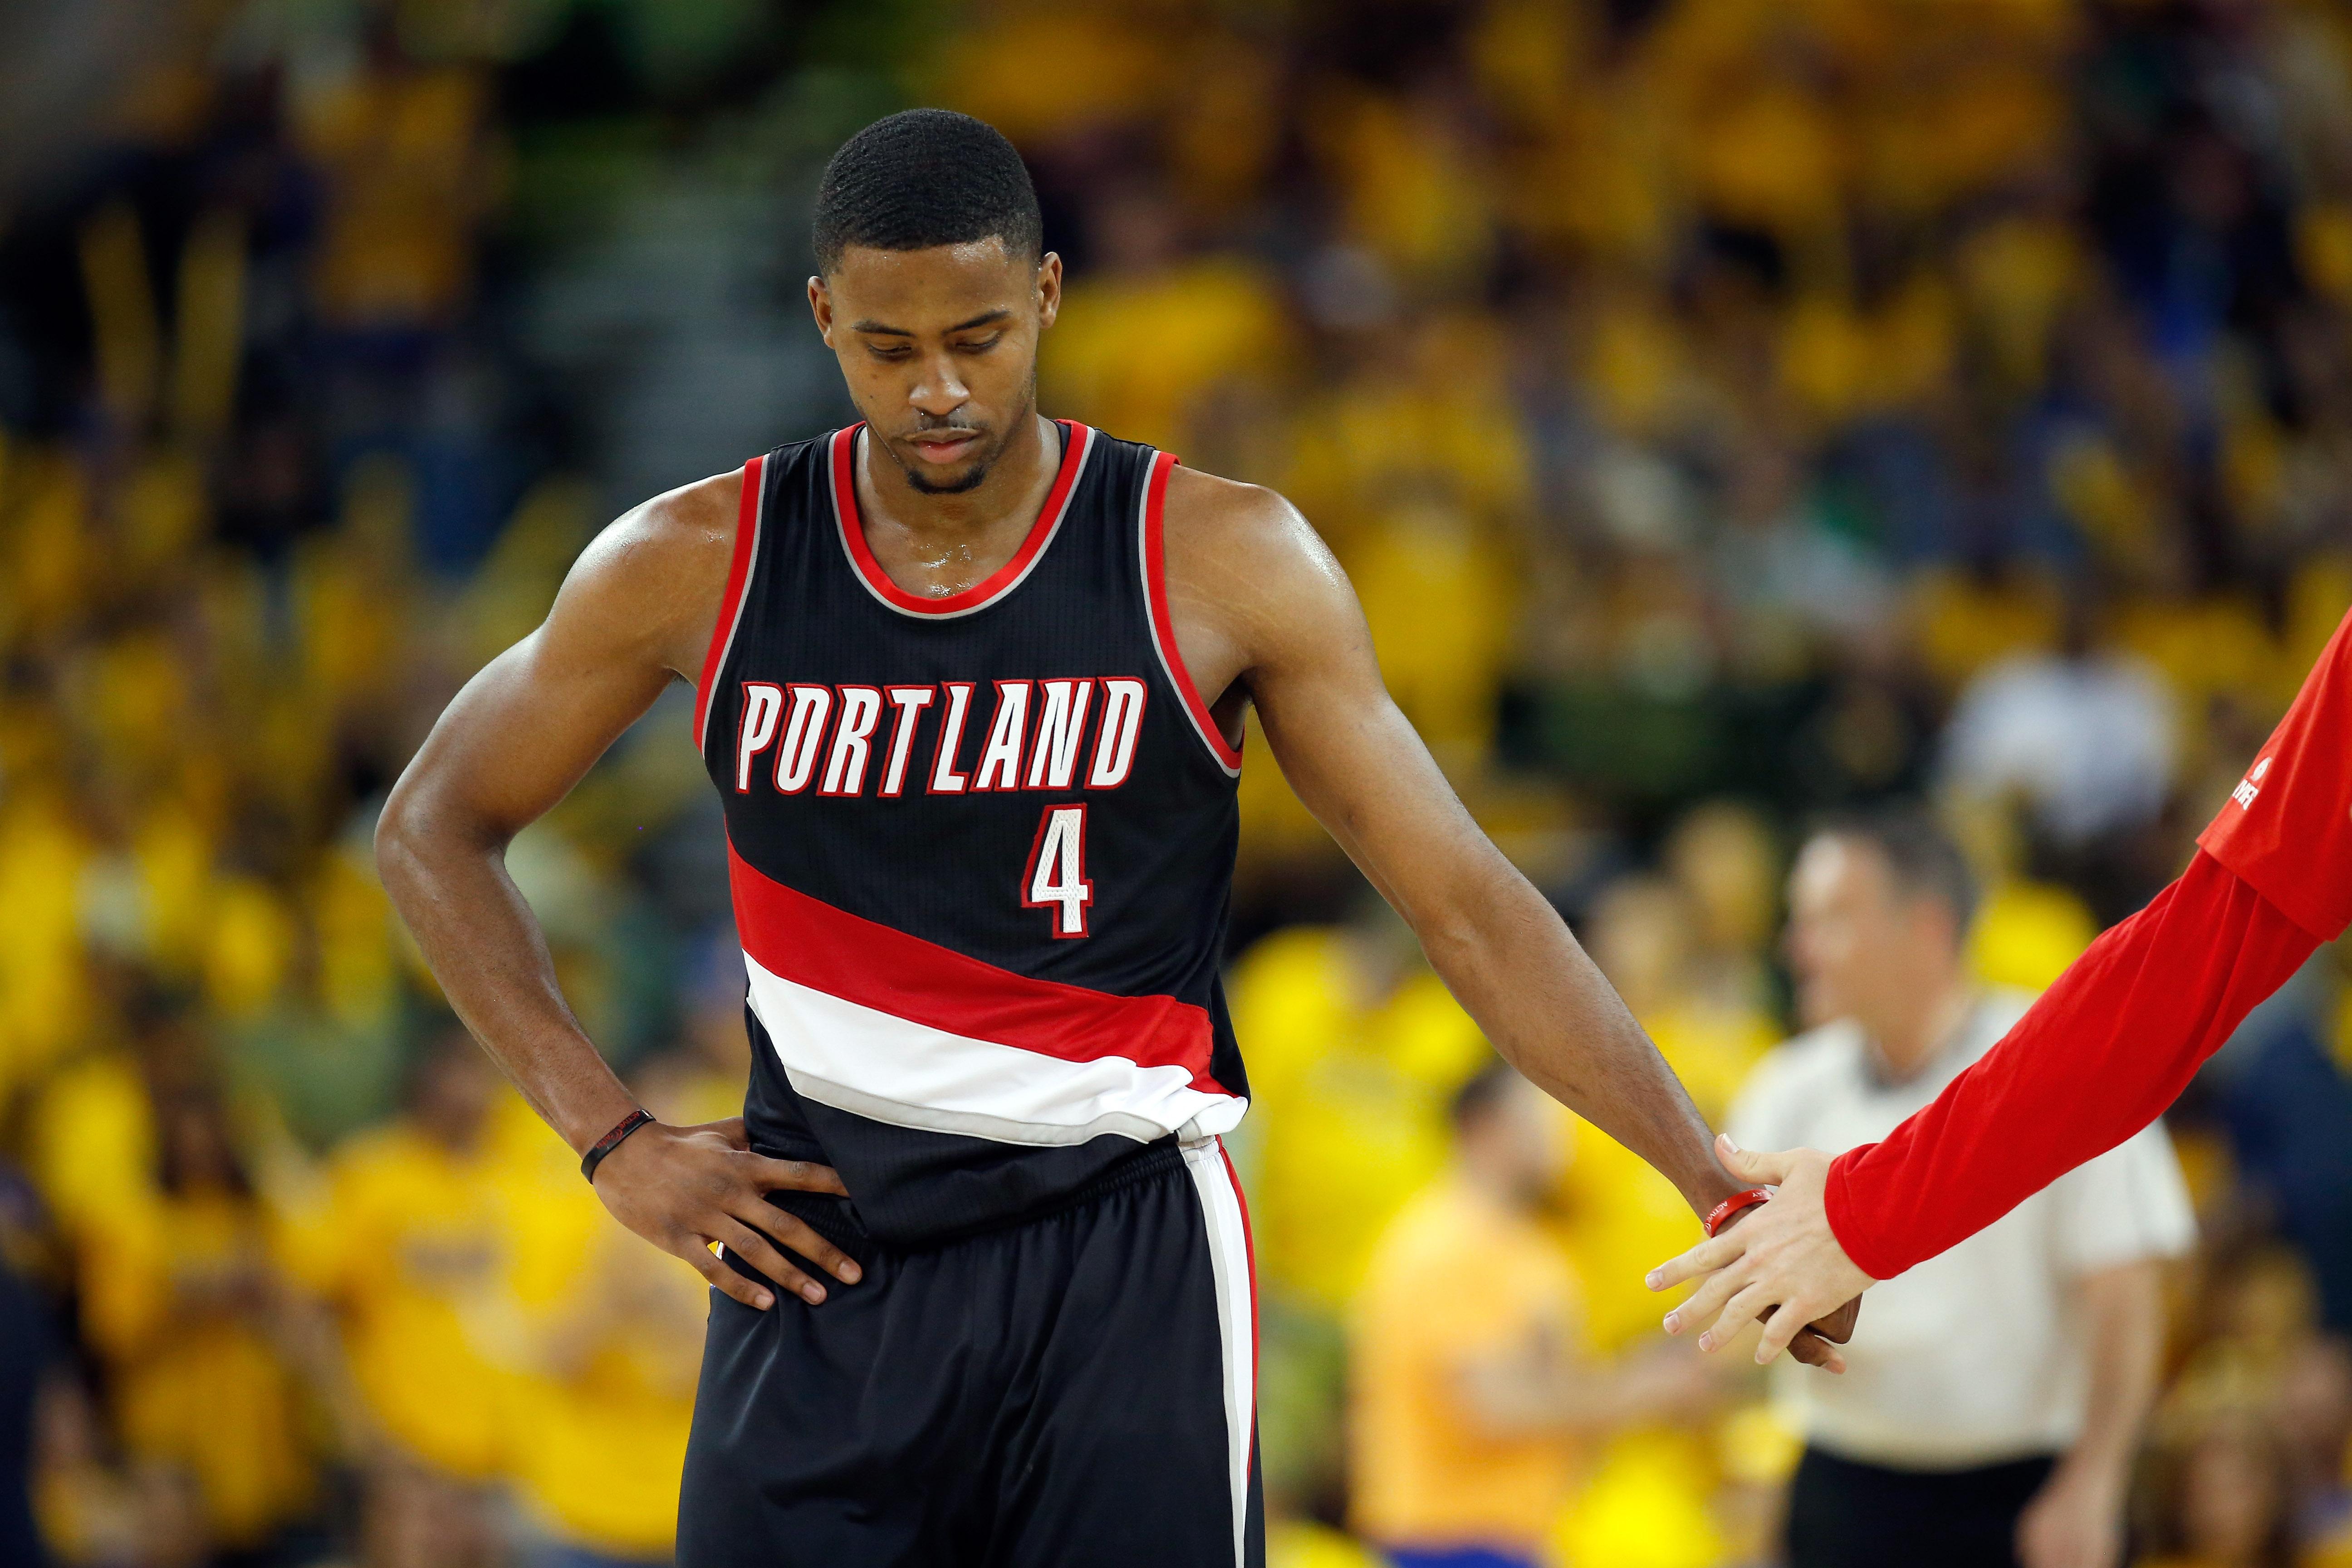 Portland Trail Blazers: Harkless says career year was good